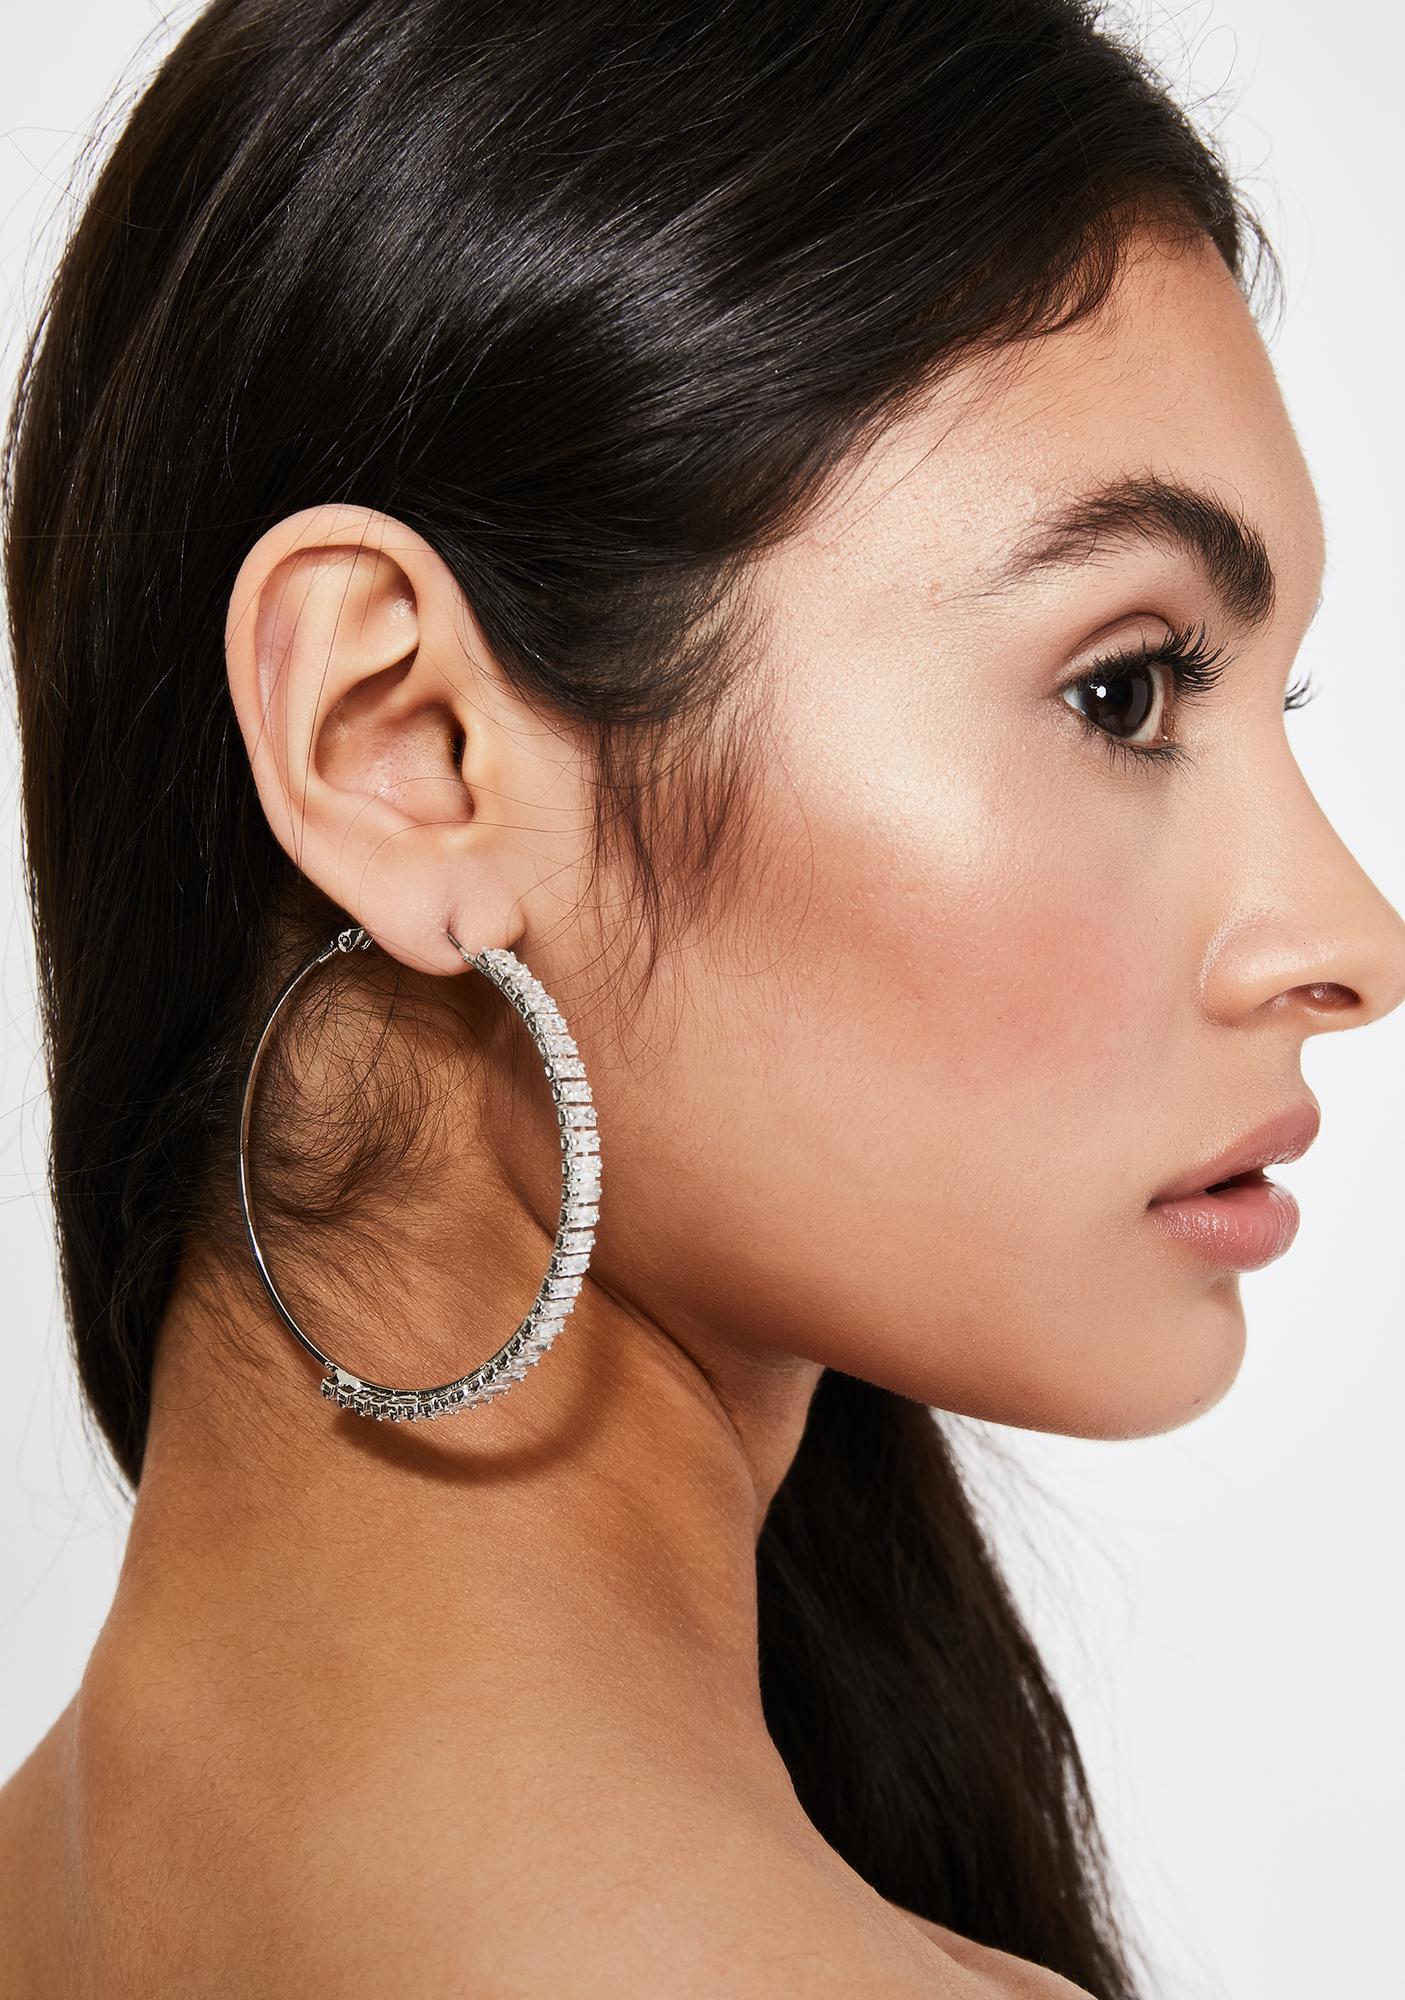 Designer Bling Hoop Earrings